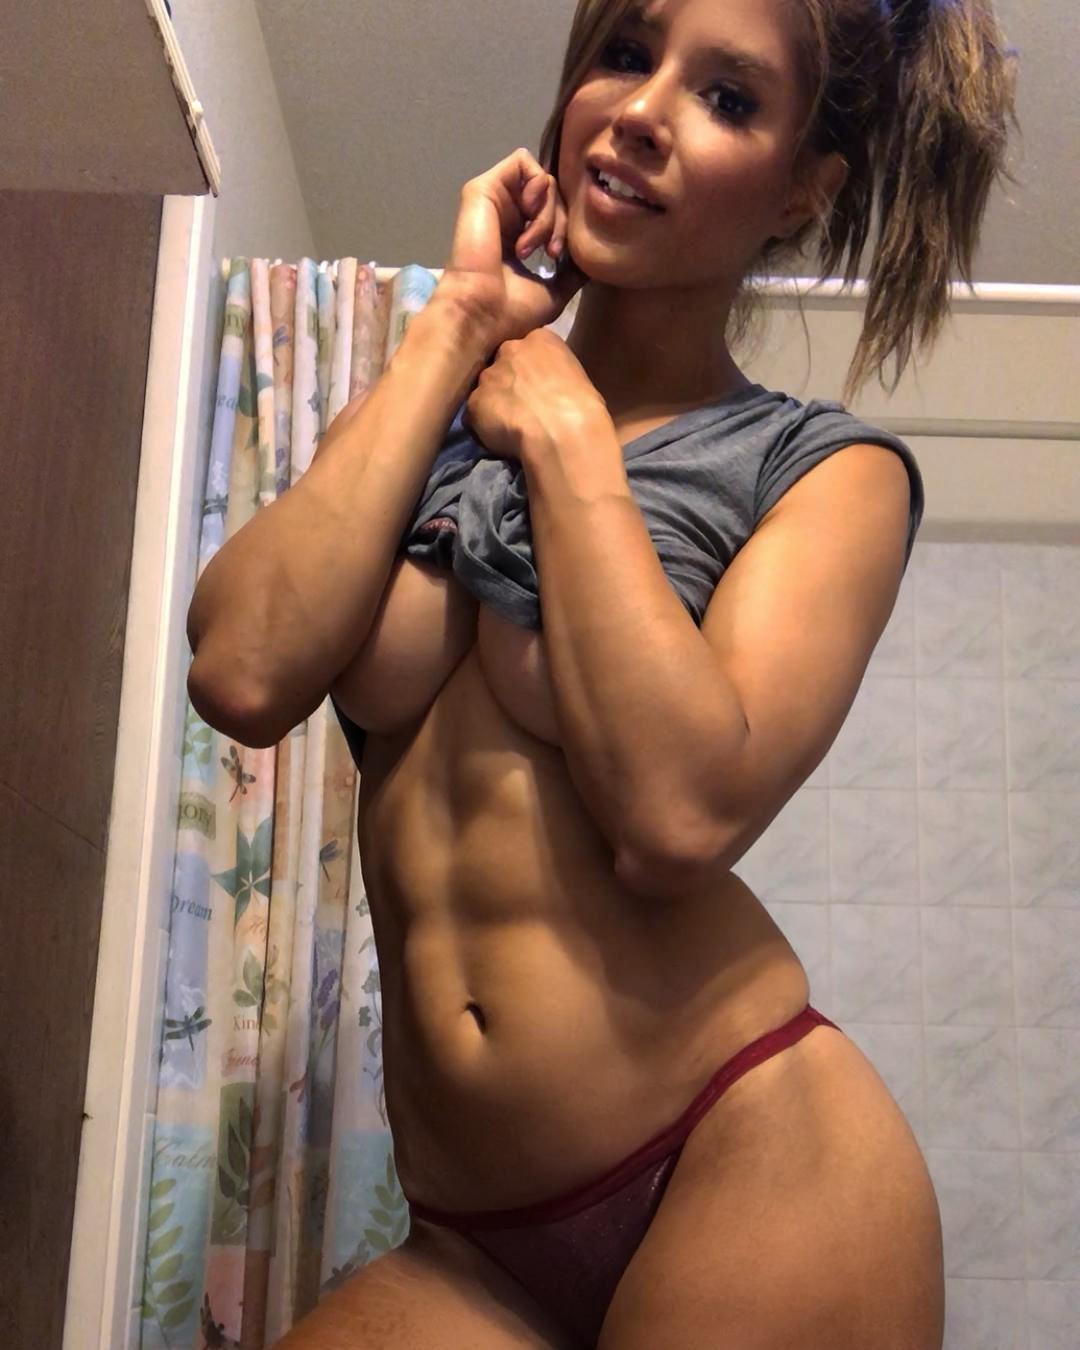 Kayli-Ann-Phillips-Nude-Sexy-The-Fappening-Pro-5.jpg